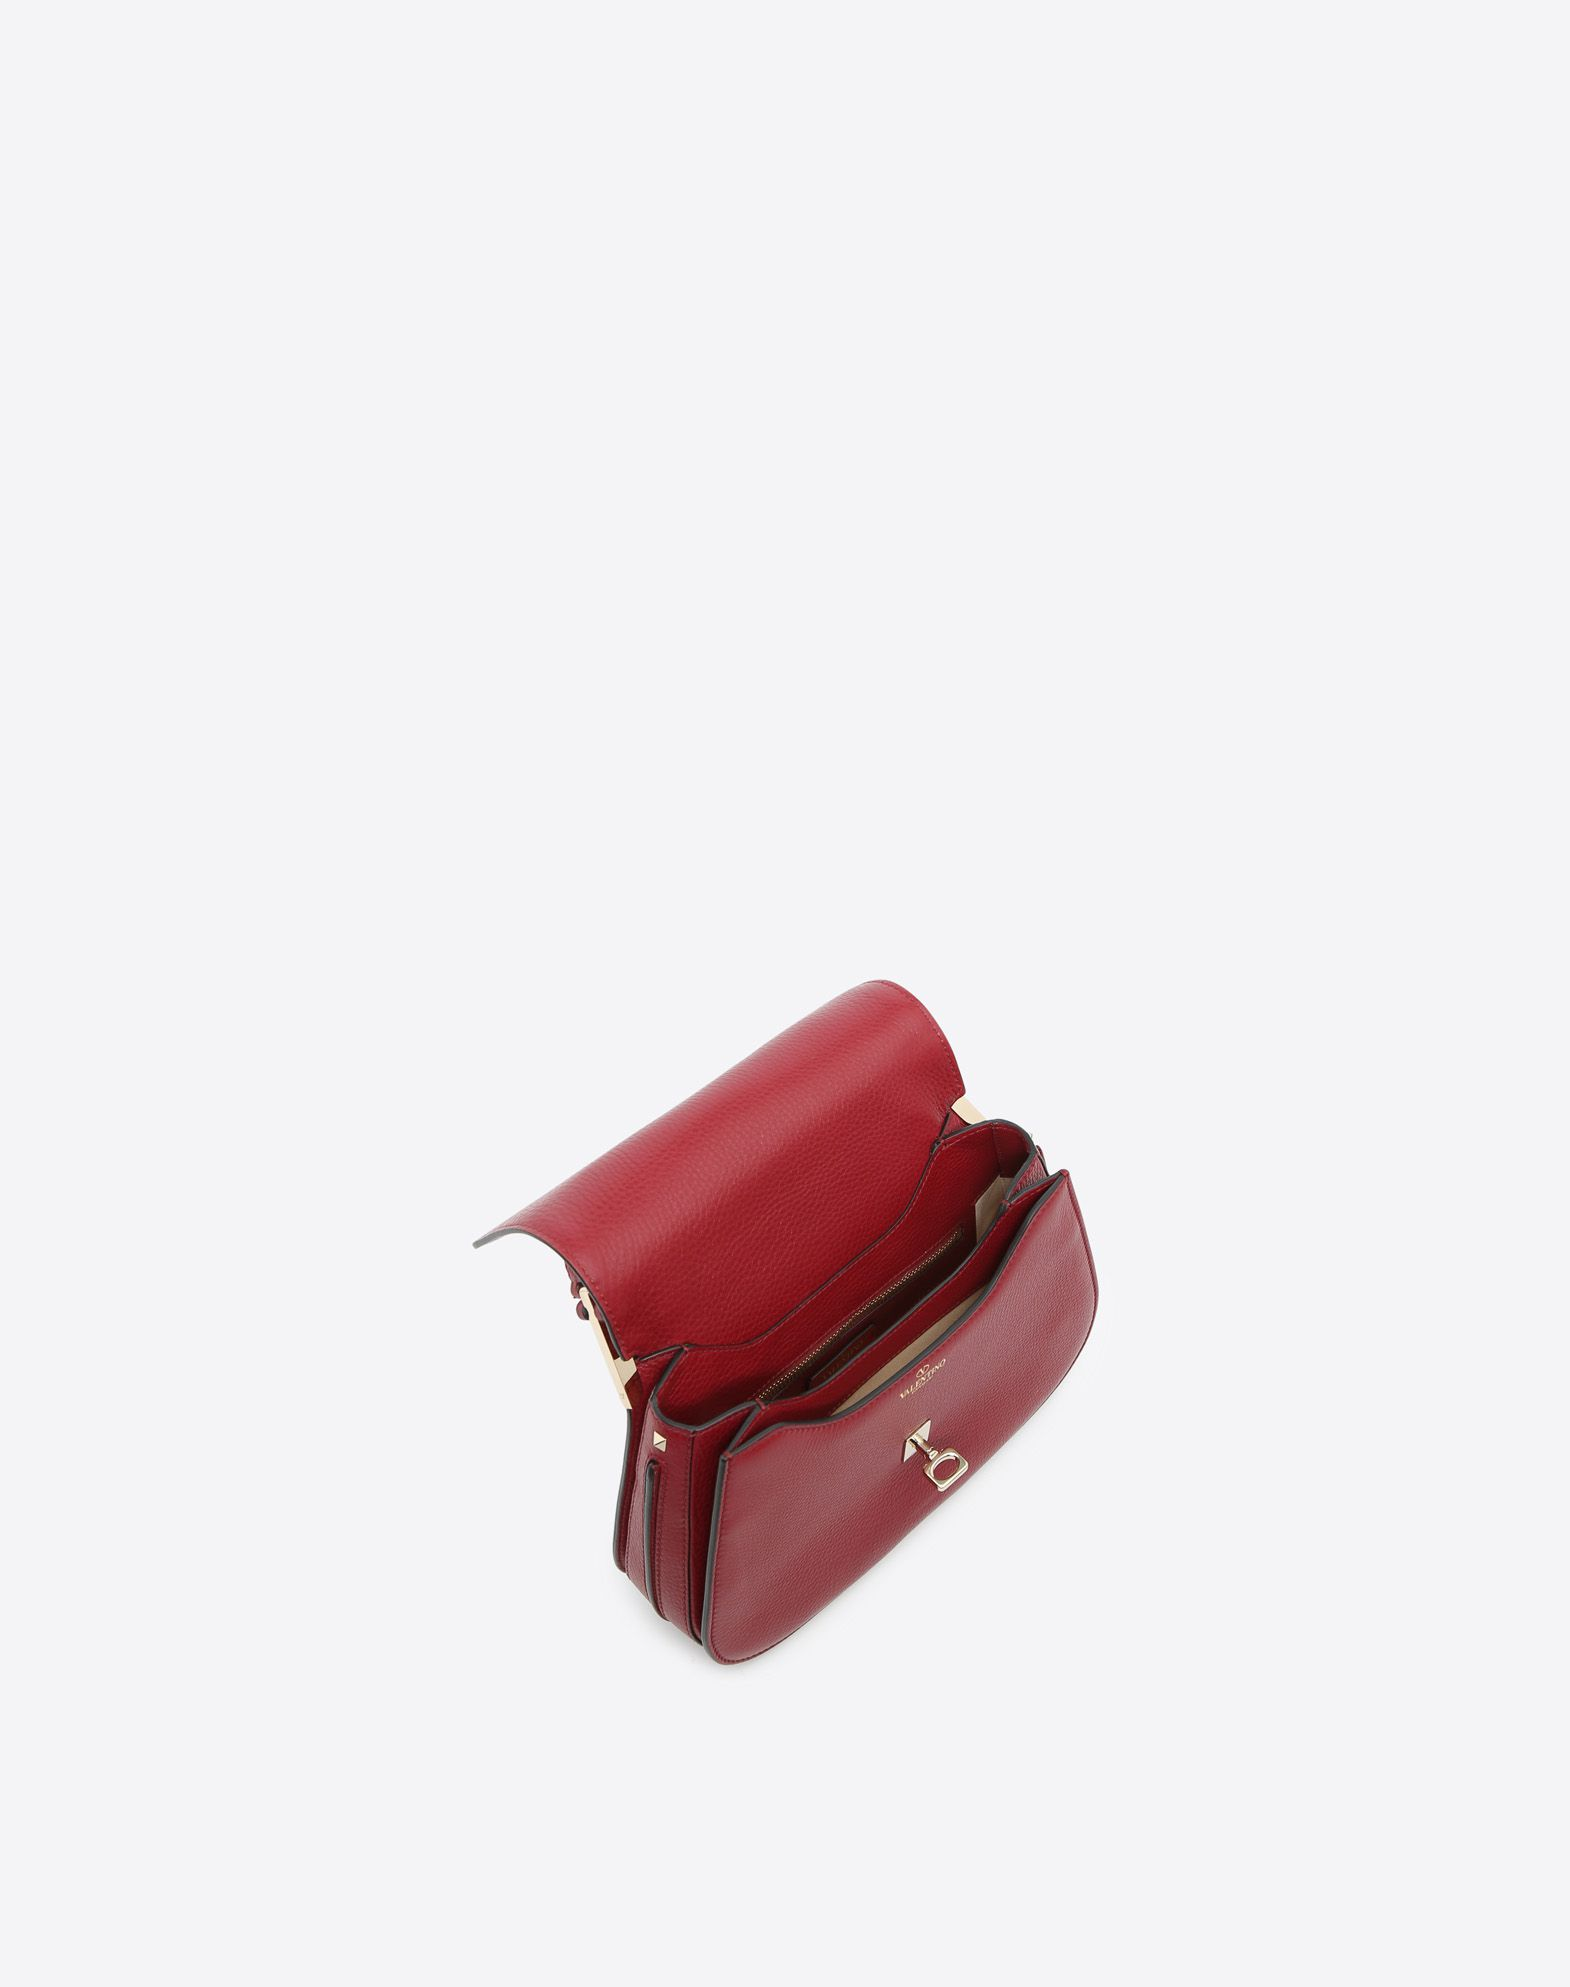 VALENTINO GARAVANI Joylock Messenger Bag Shoulder bag D e